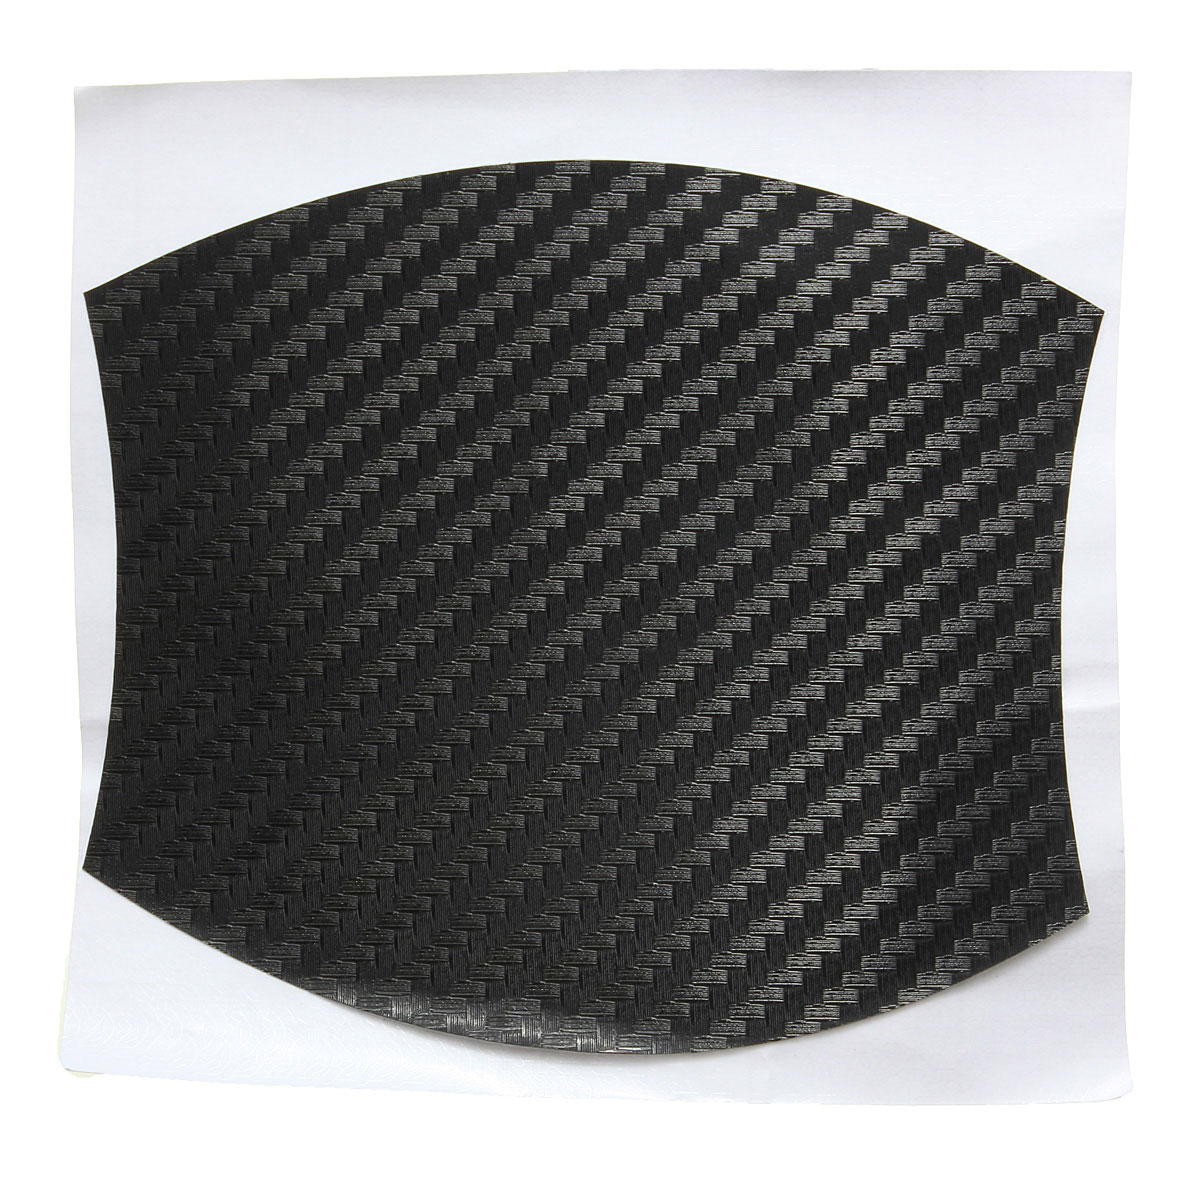 4x Car Door Handle Scratch Cover Guard Protector Molding Trim Adhesive Remova